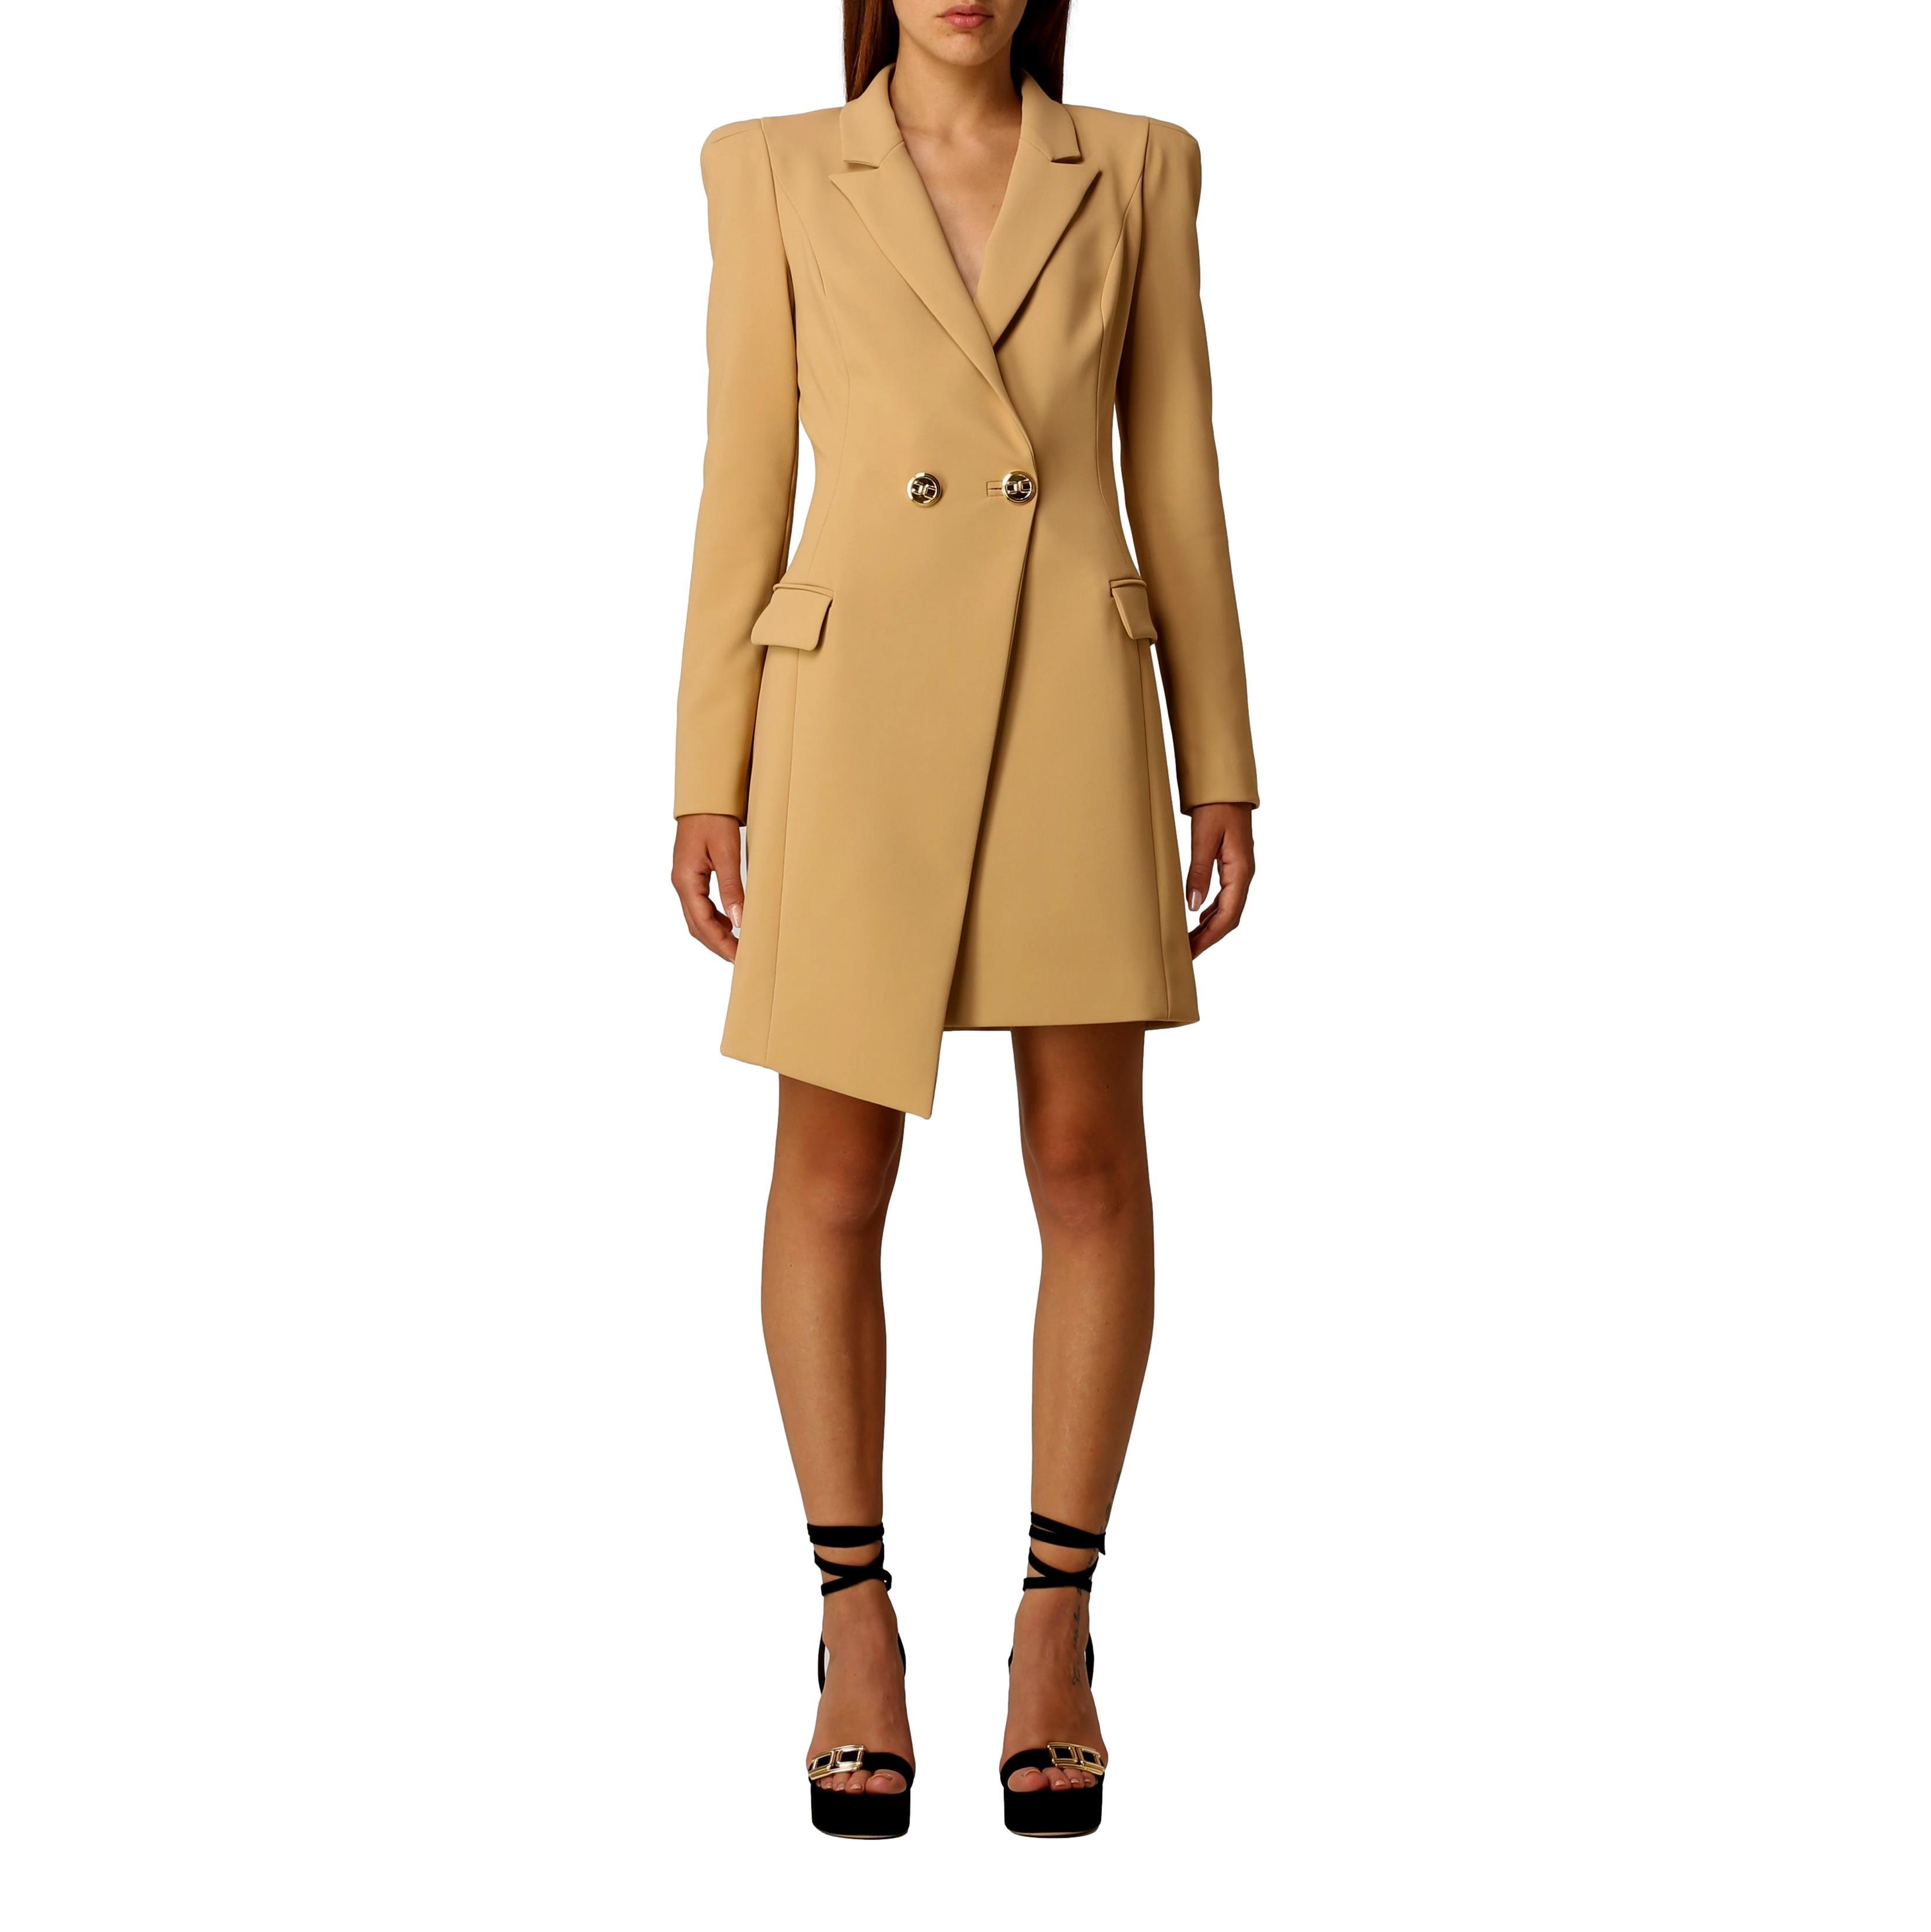 Robe manteau asymmetrical dress with lapel ELISABETTA FRANCHI |  | AB09116E2470